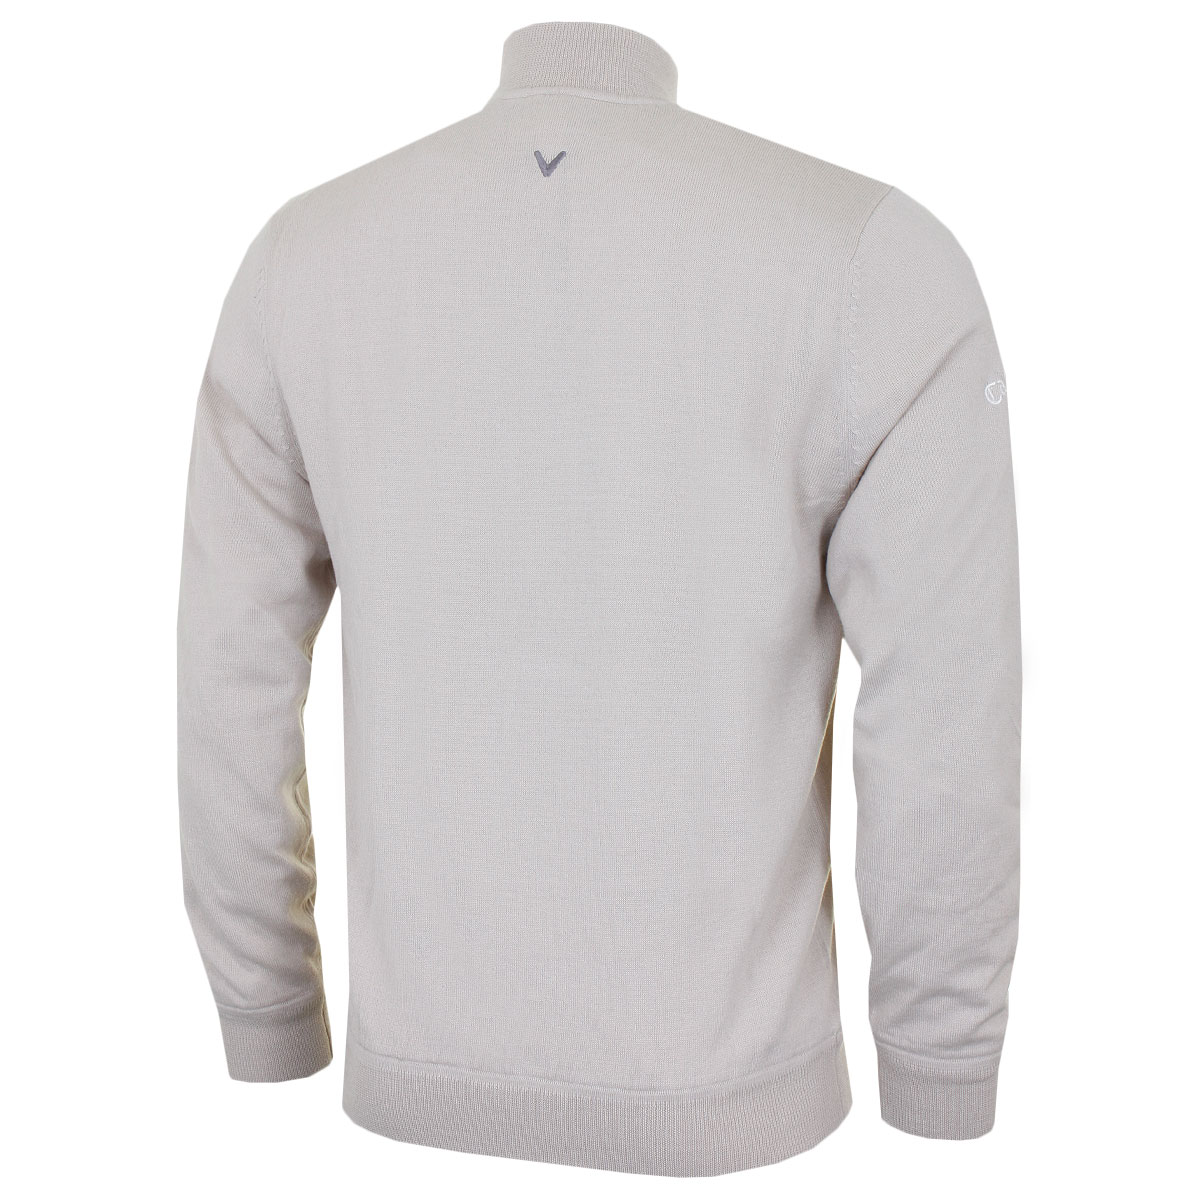 Callaway-Golf-Mens-1-4-Zip-Mock-Merino-Windproof-Sweater-Pullover-49-OFF-RRP thumbnail 18